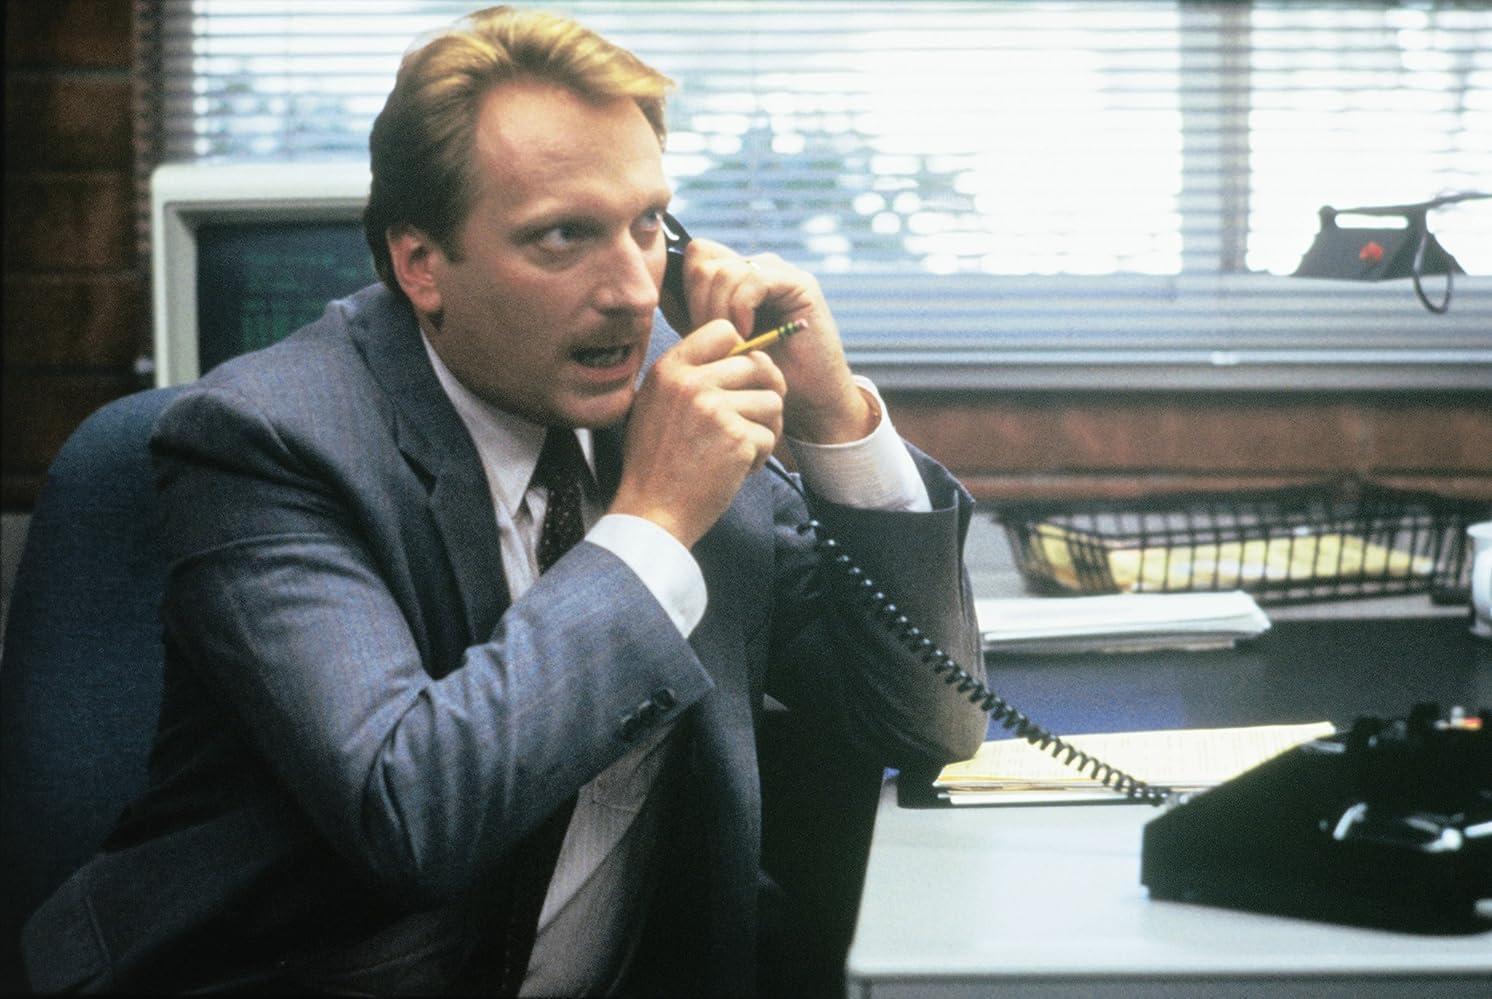 Jeffrey Jones in Ferris Bueller's Day Off (1986)